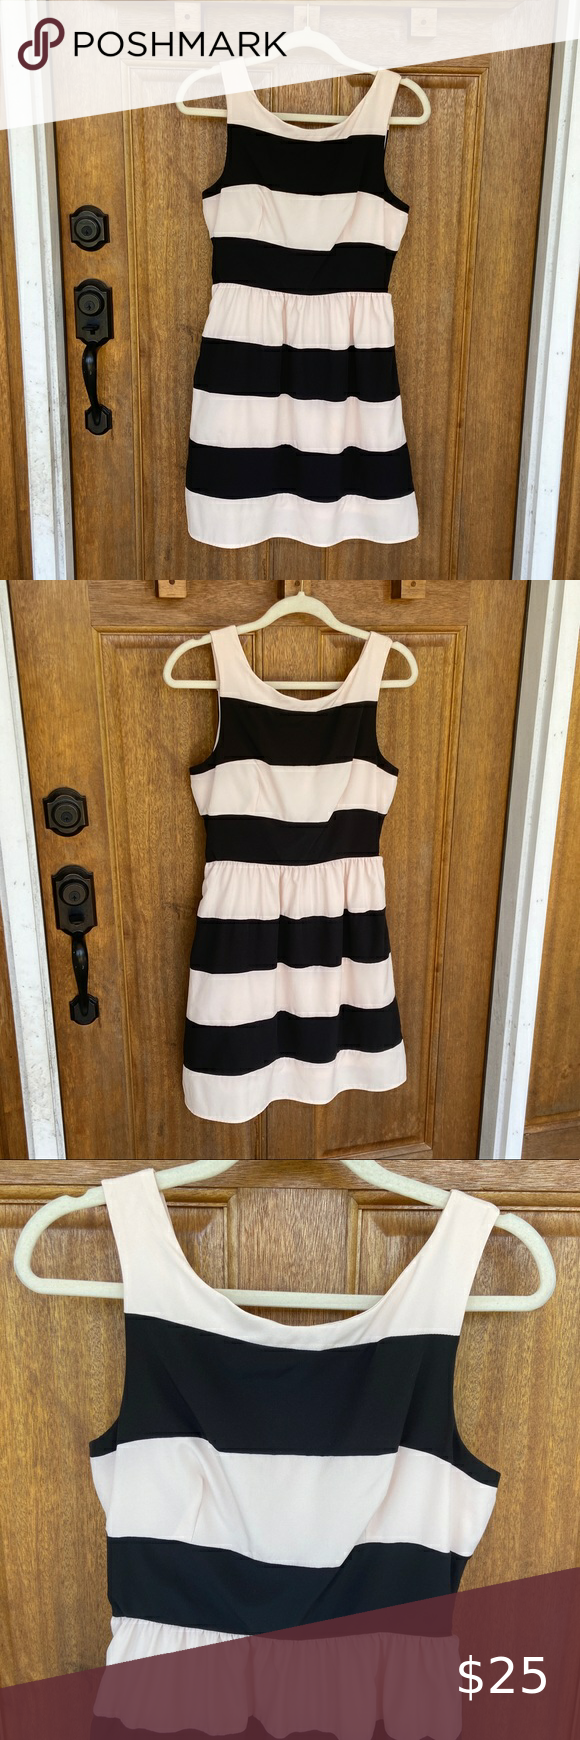 Rhapsody Black Cream Thick Striped Dress Medium Clothes Design Striped Sleeveless Dress Dresses [ 1740 x 580 Pixel ]